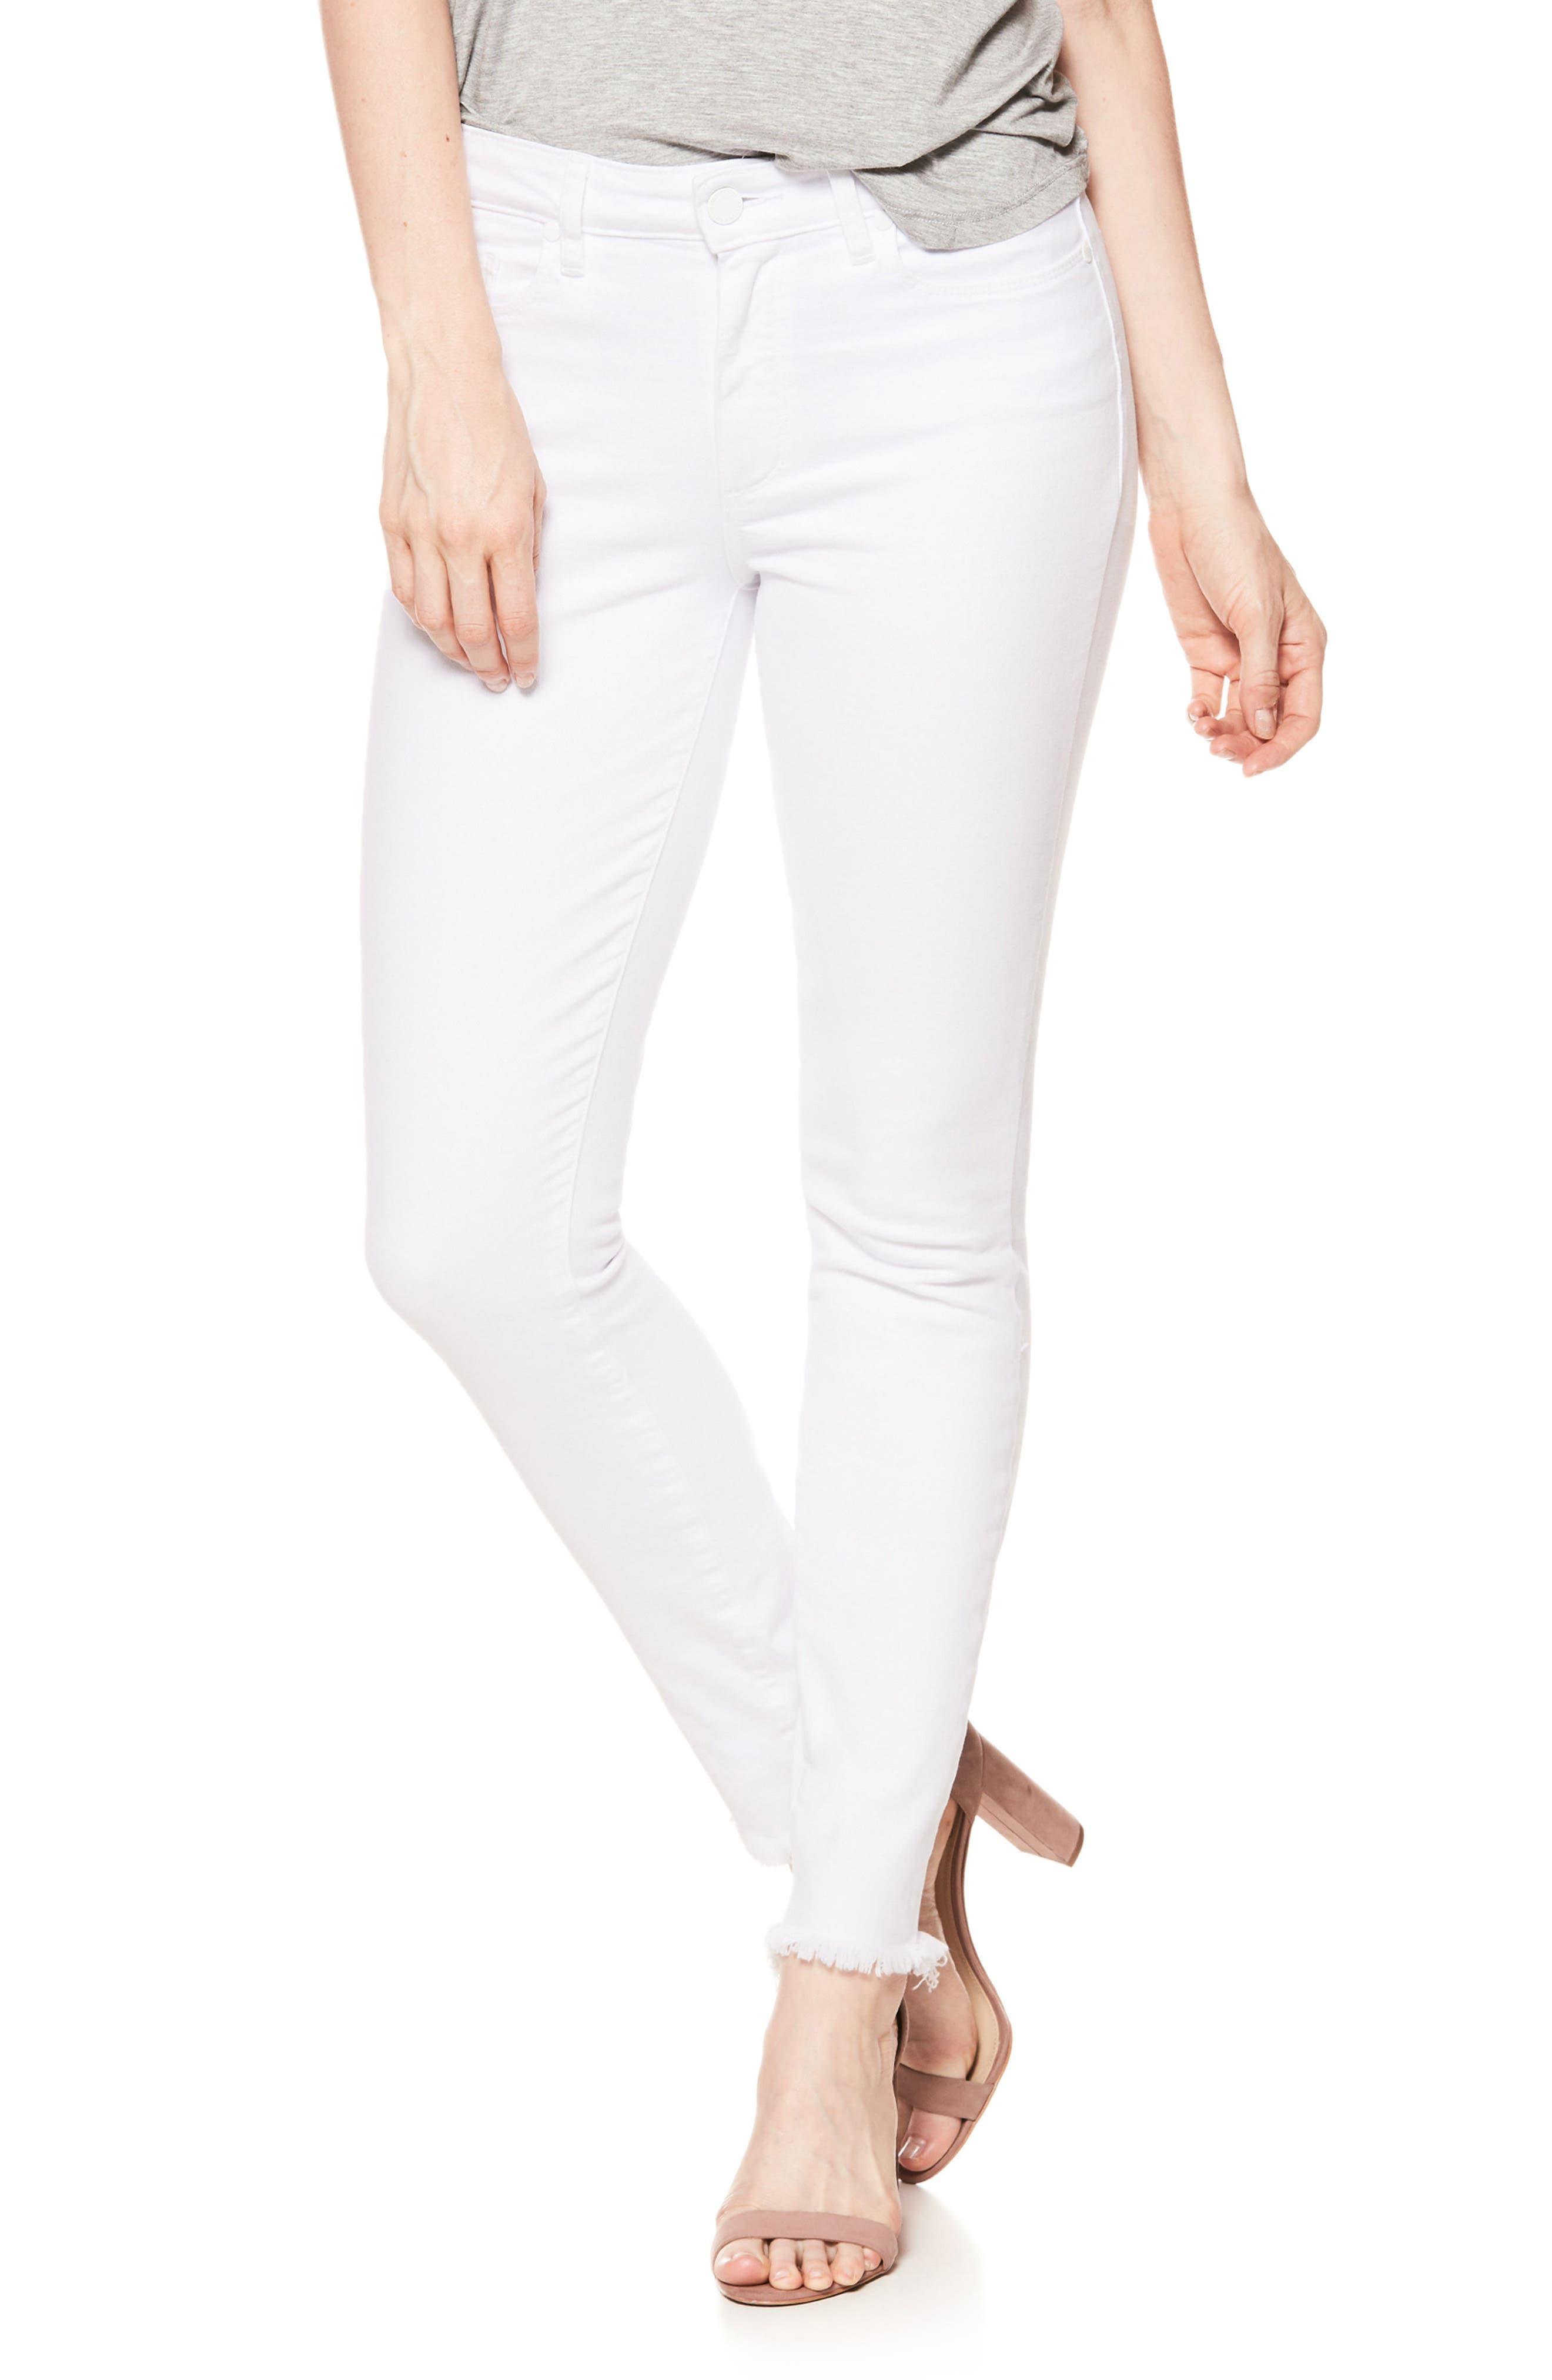 Hoxton High Waist Ankle Skinny Jeans,                         Main,                         color, CRISP WHITE